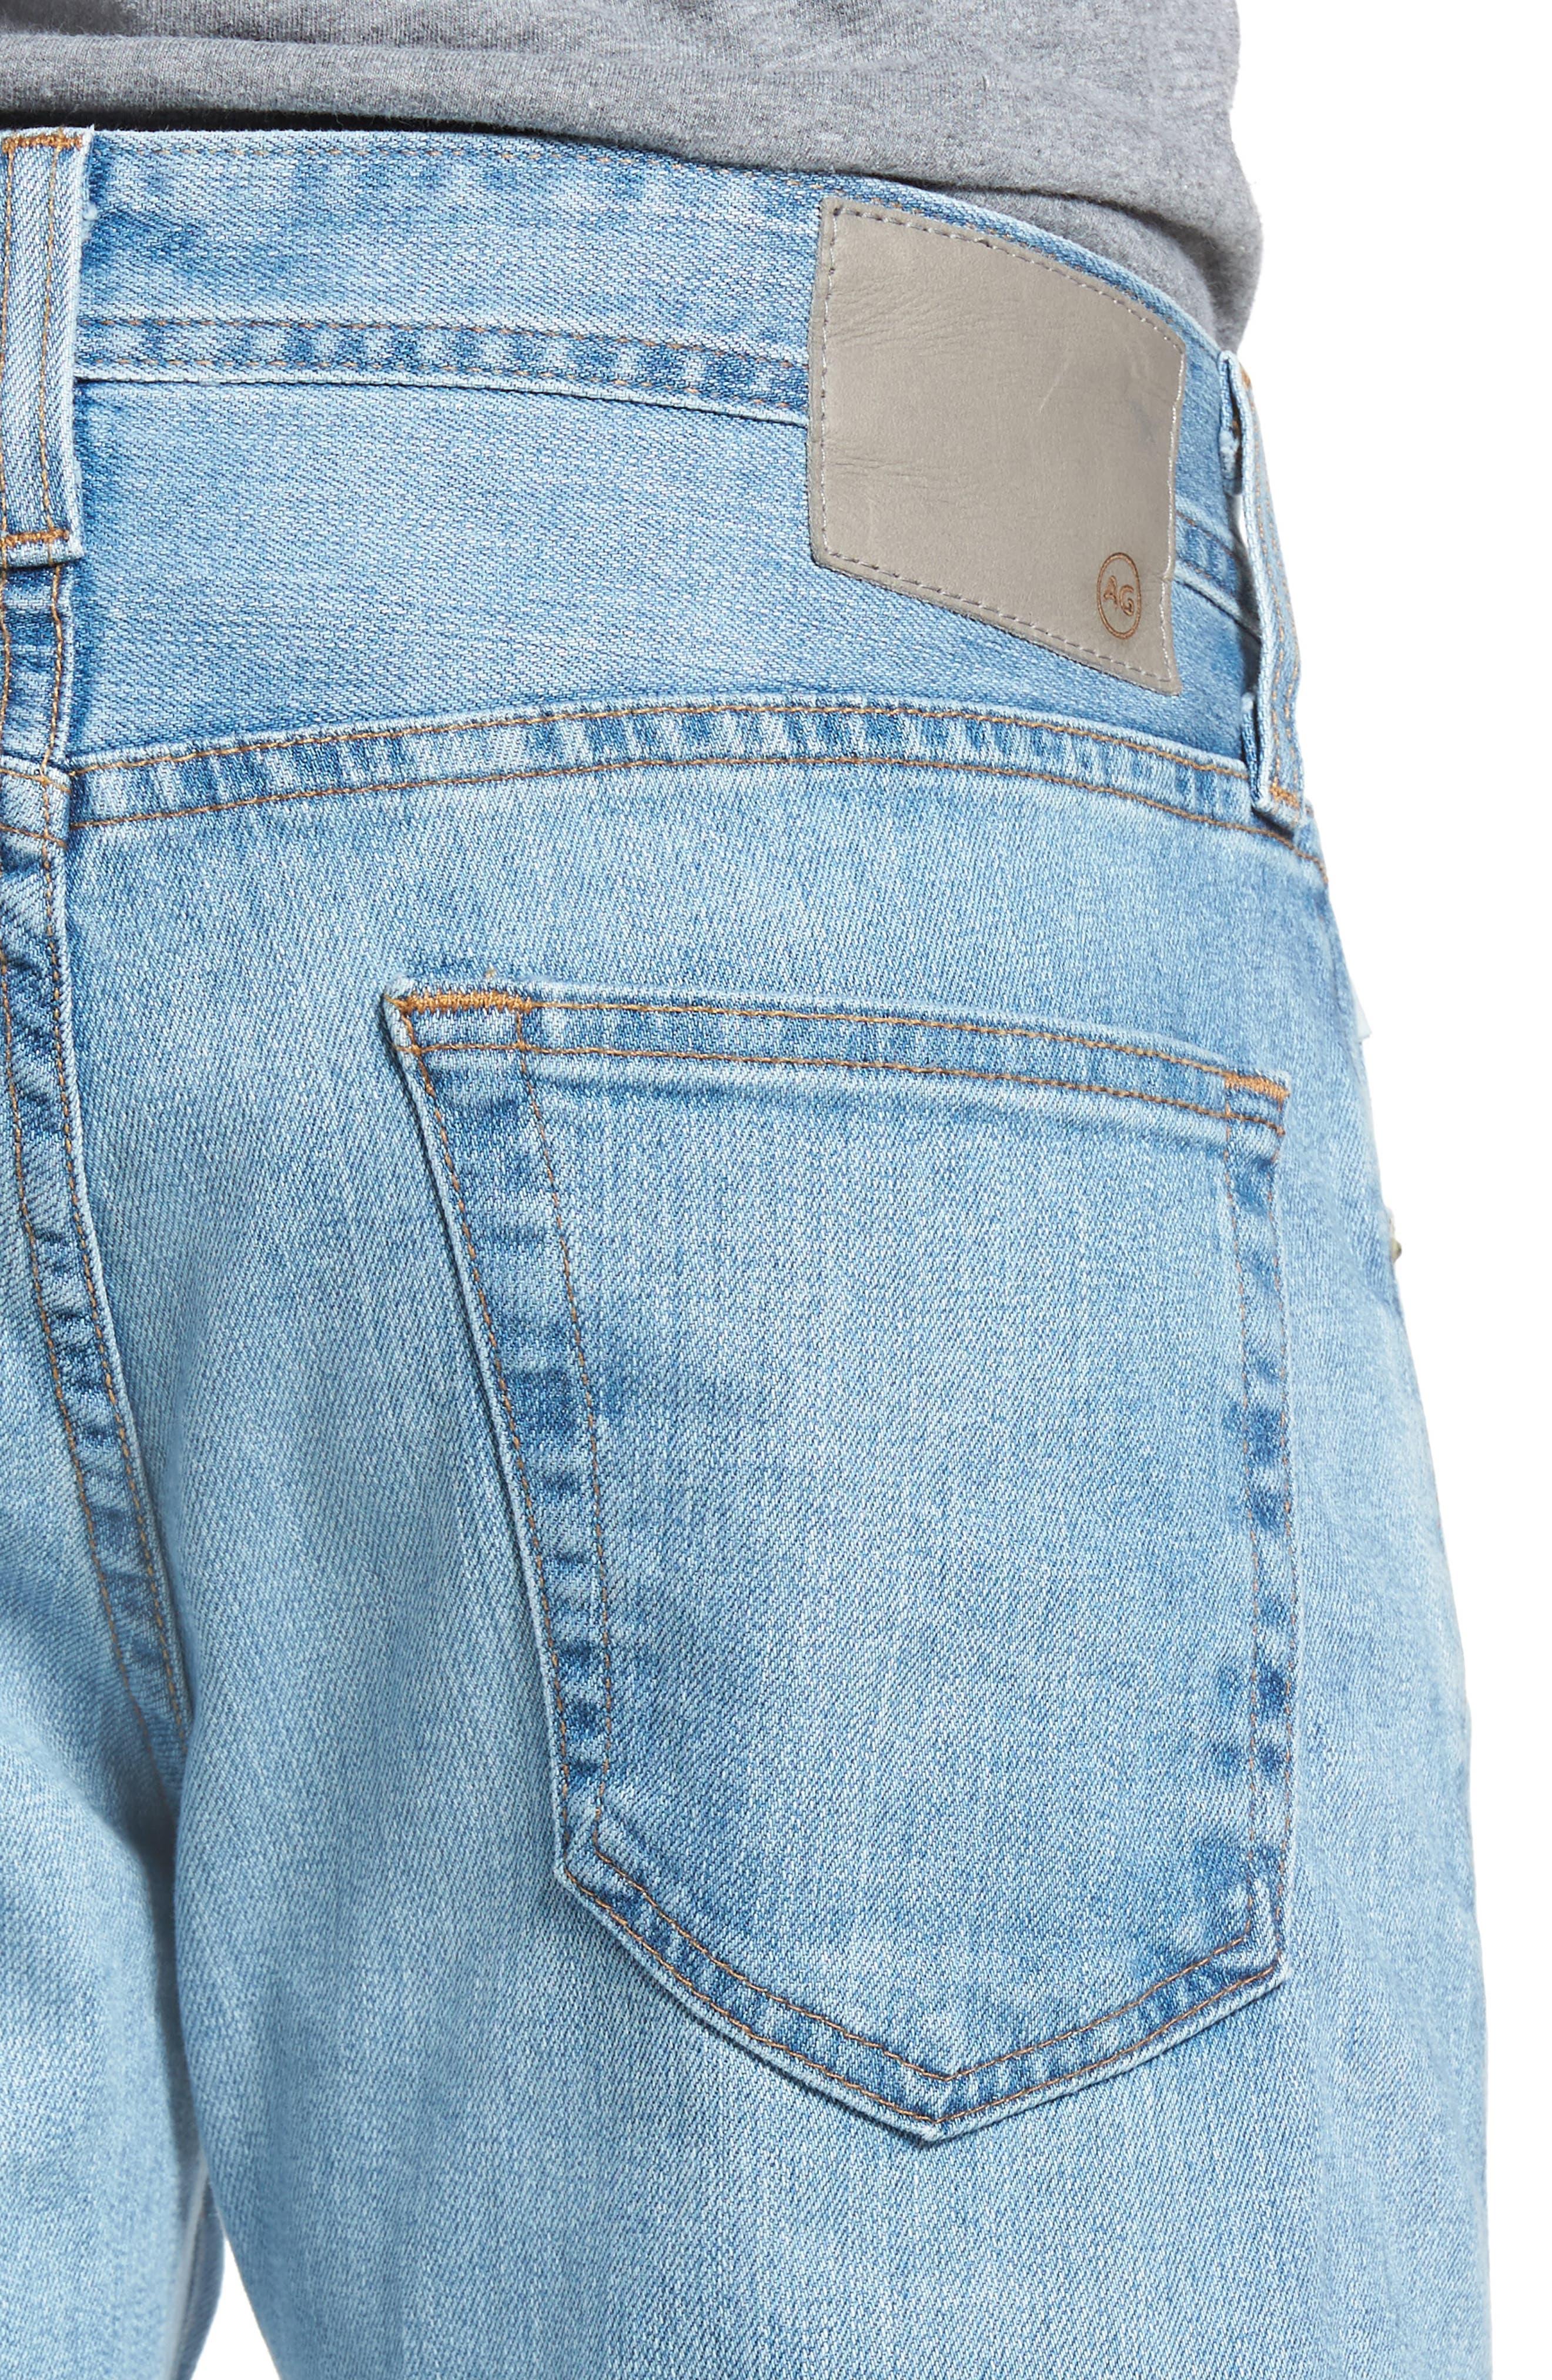 Tellis Slim Fit Jeans,                             Alternate thumbnail 4, color,                             412